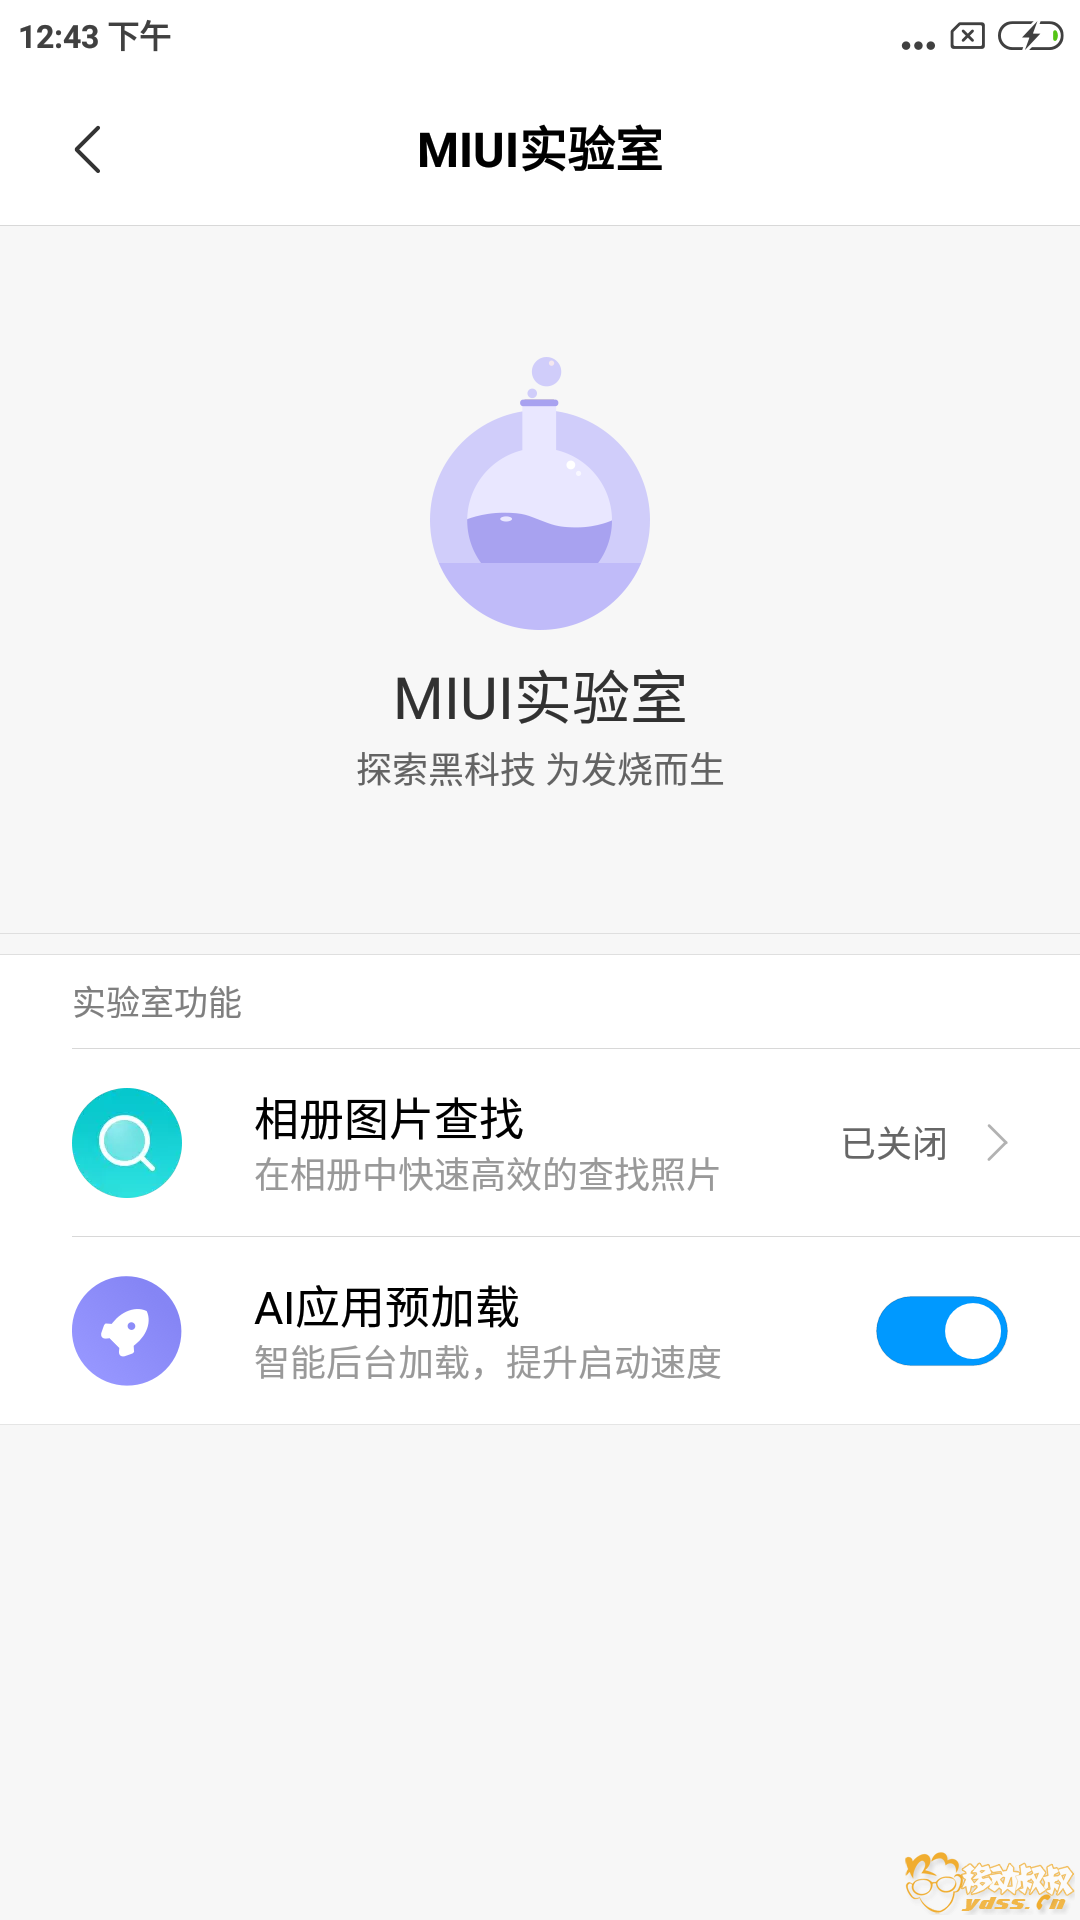 Screenshot_2018-10-11-12-43-45-296_com.android.settings.png